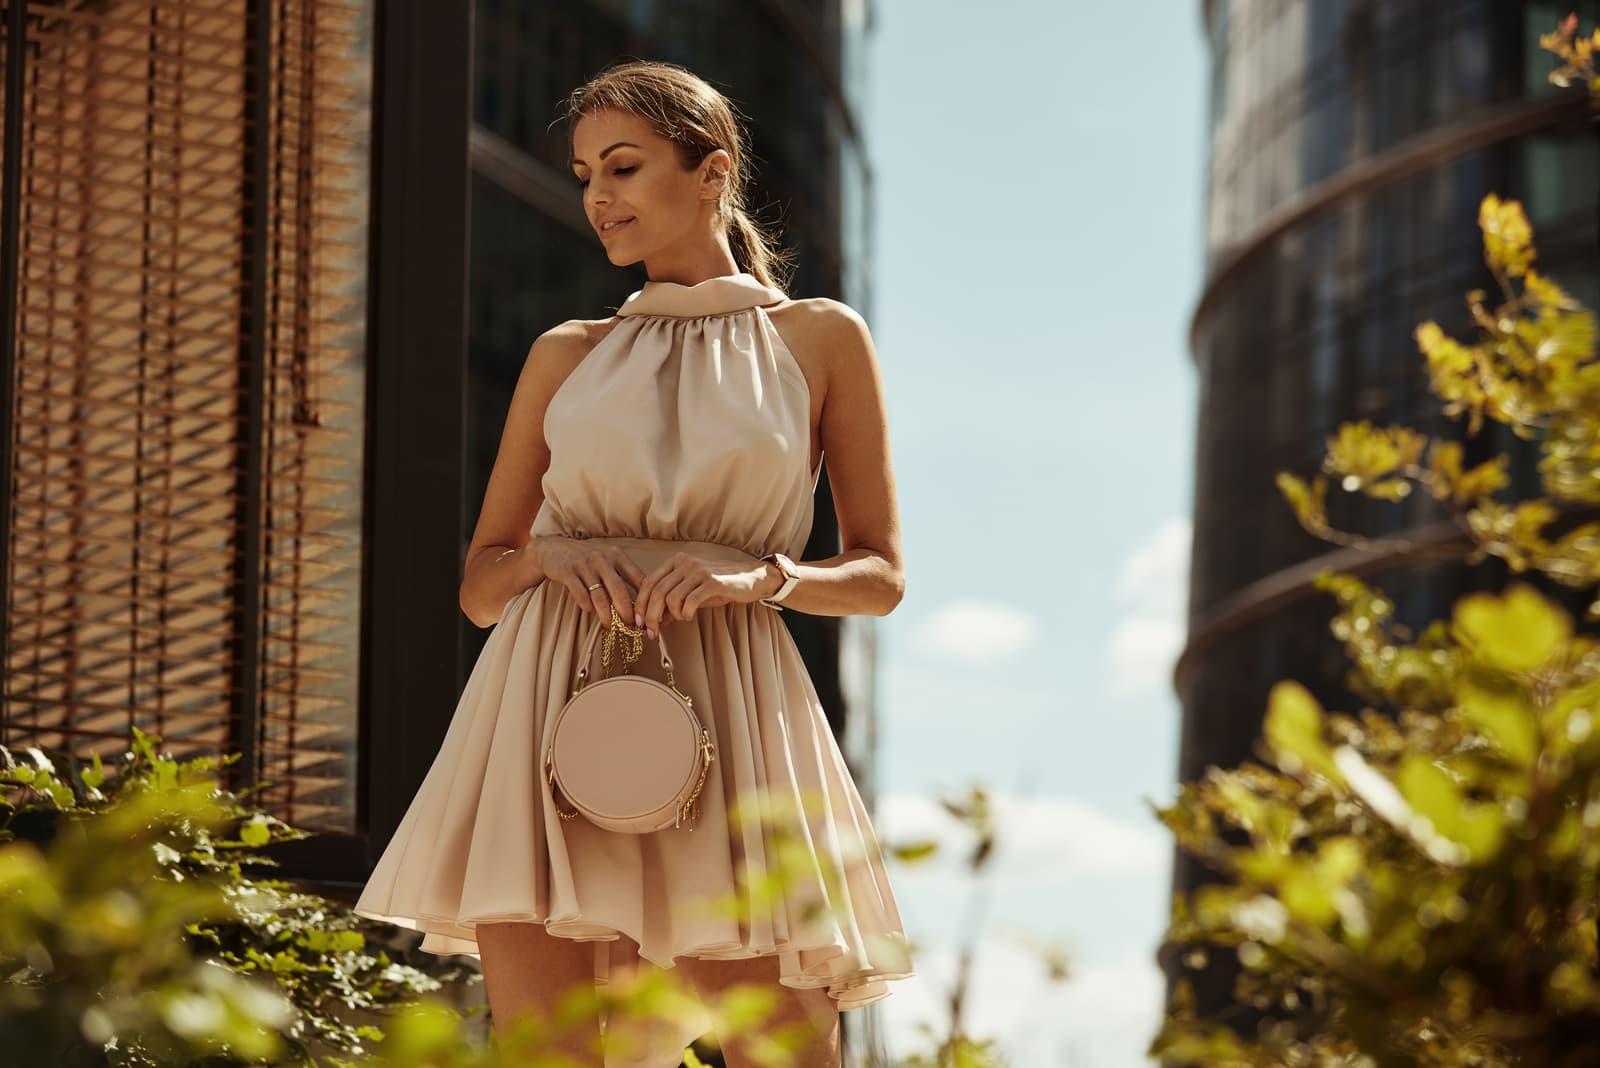 woman with small handbag wear summer dress